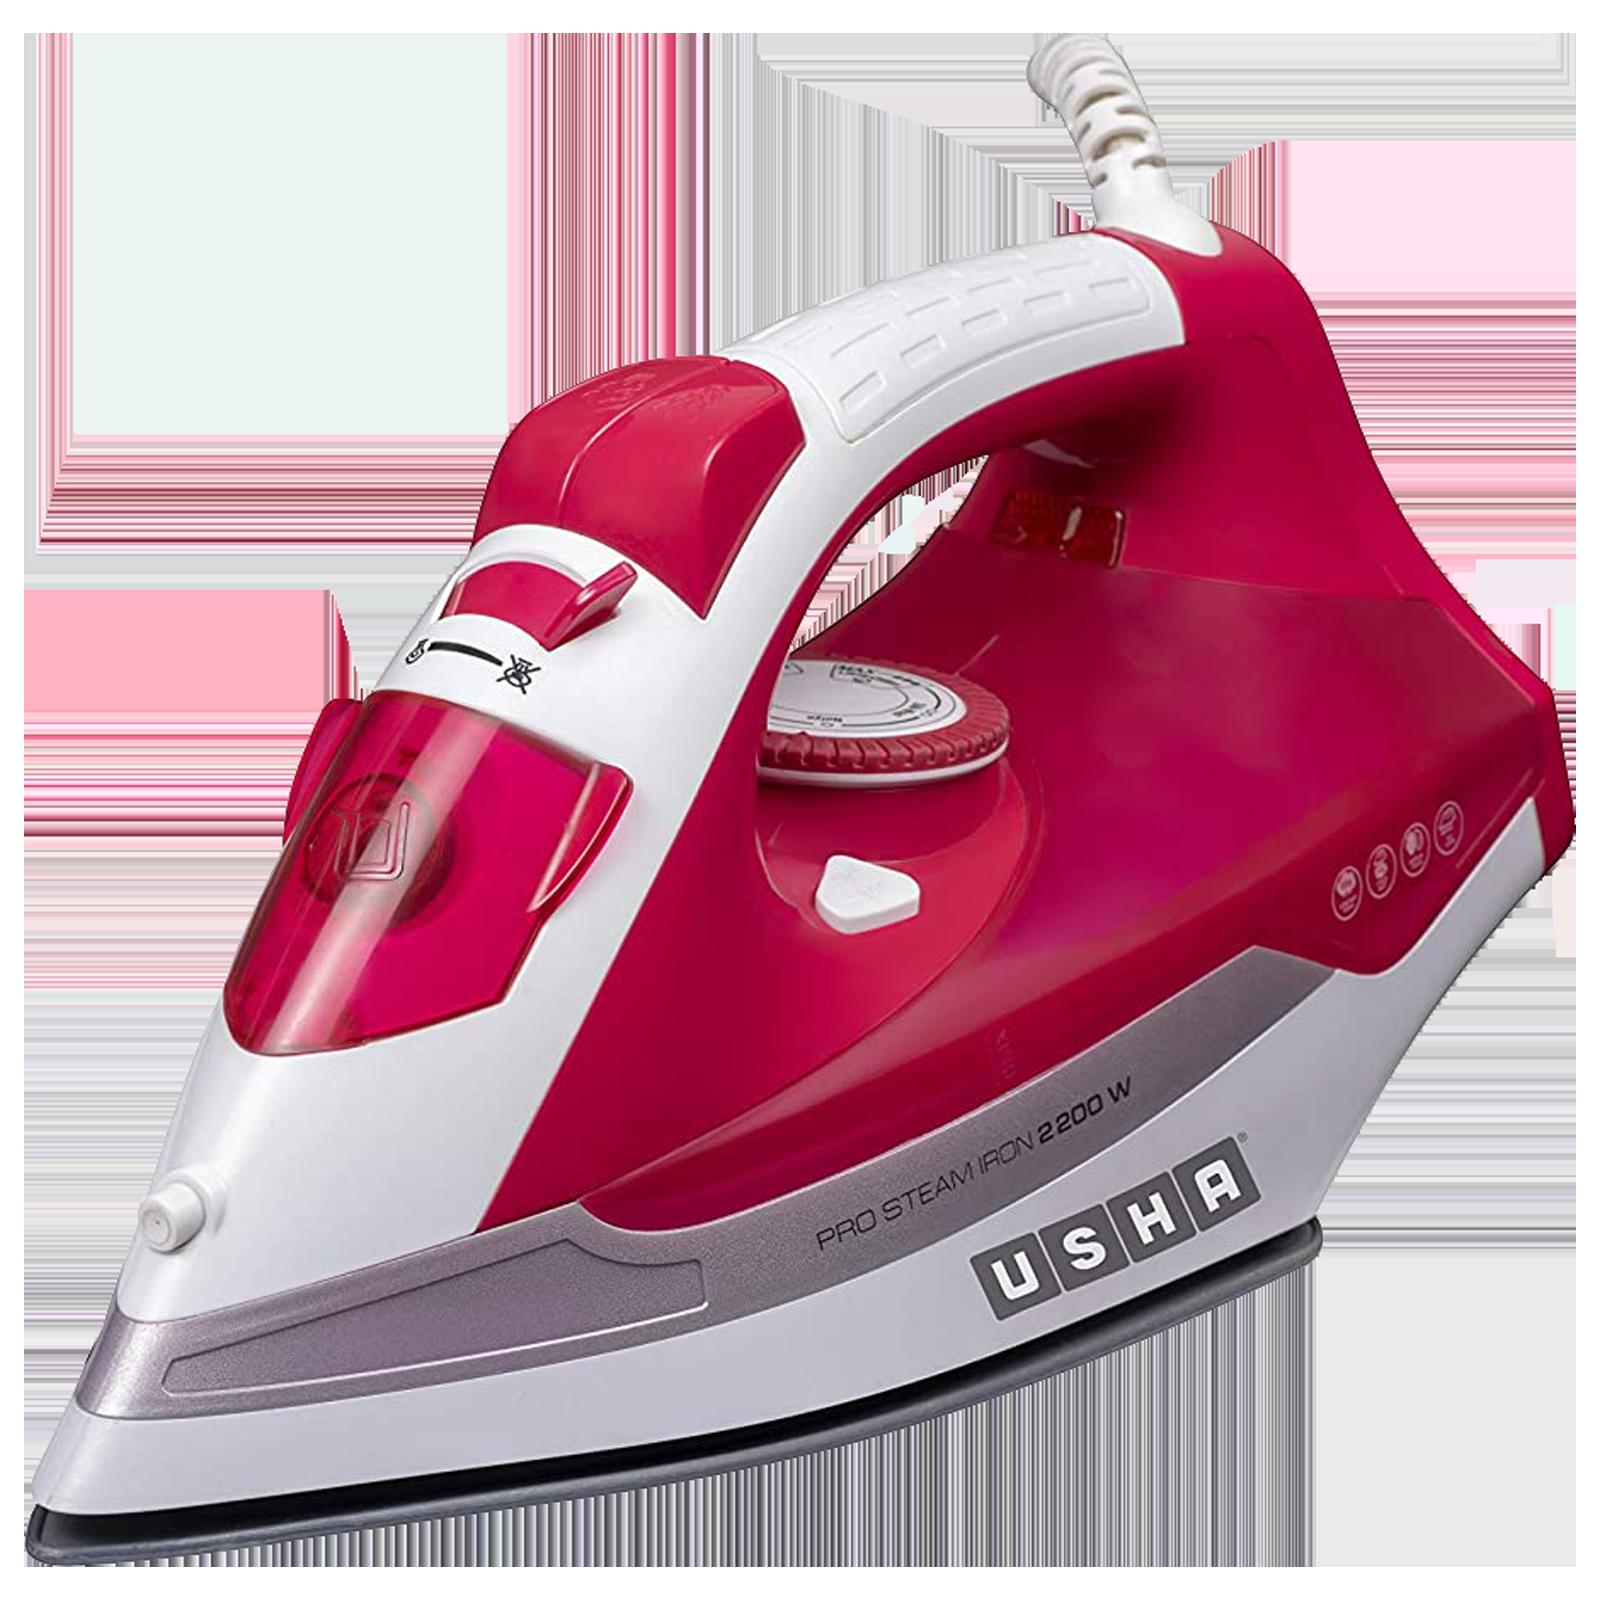 Usha Grand Jet 2200 Watts 400ml Steam Iron (Detachable Water Tank, GJ2200CS, Pink)_1